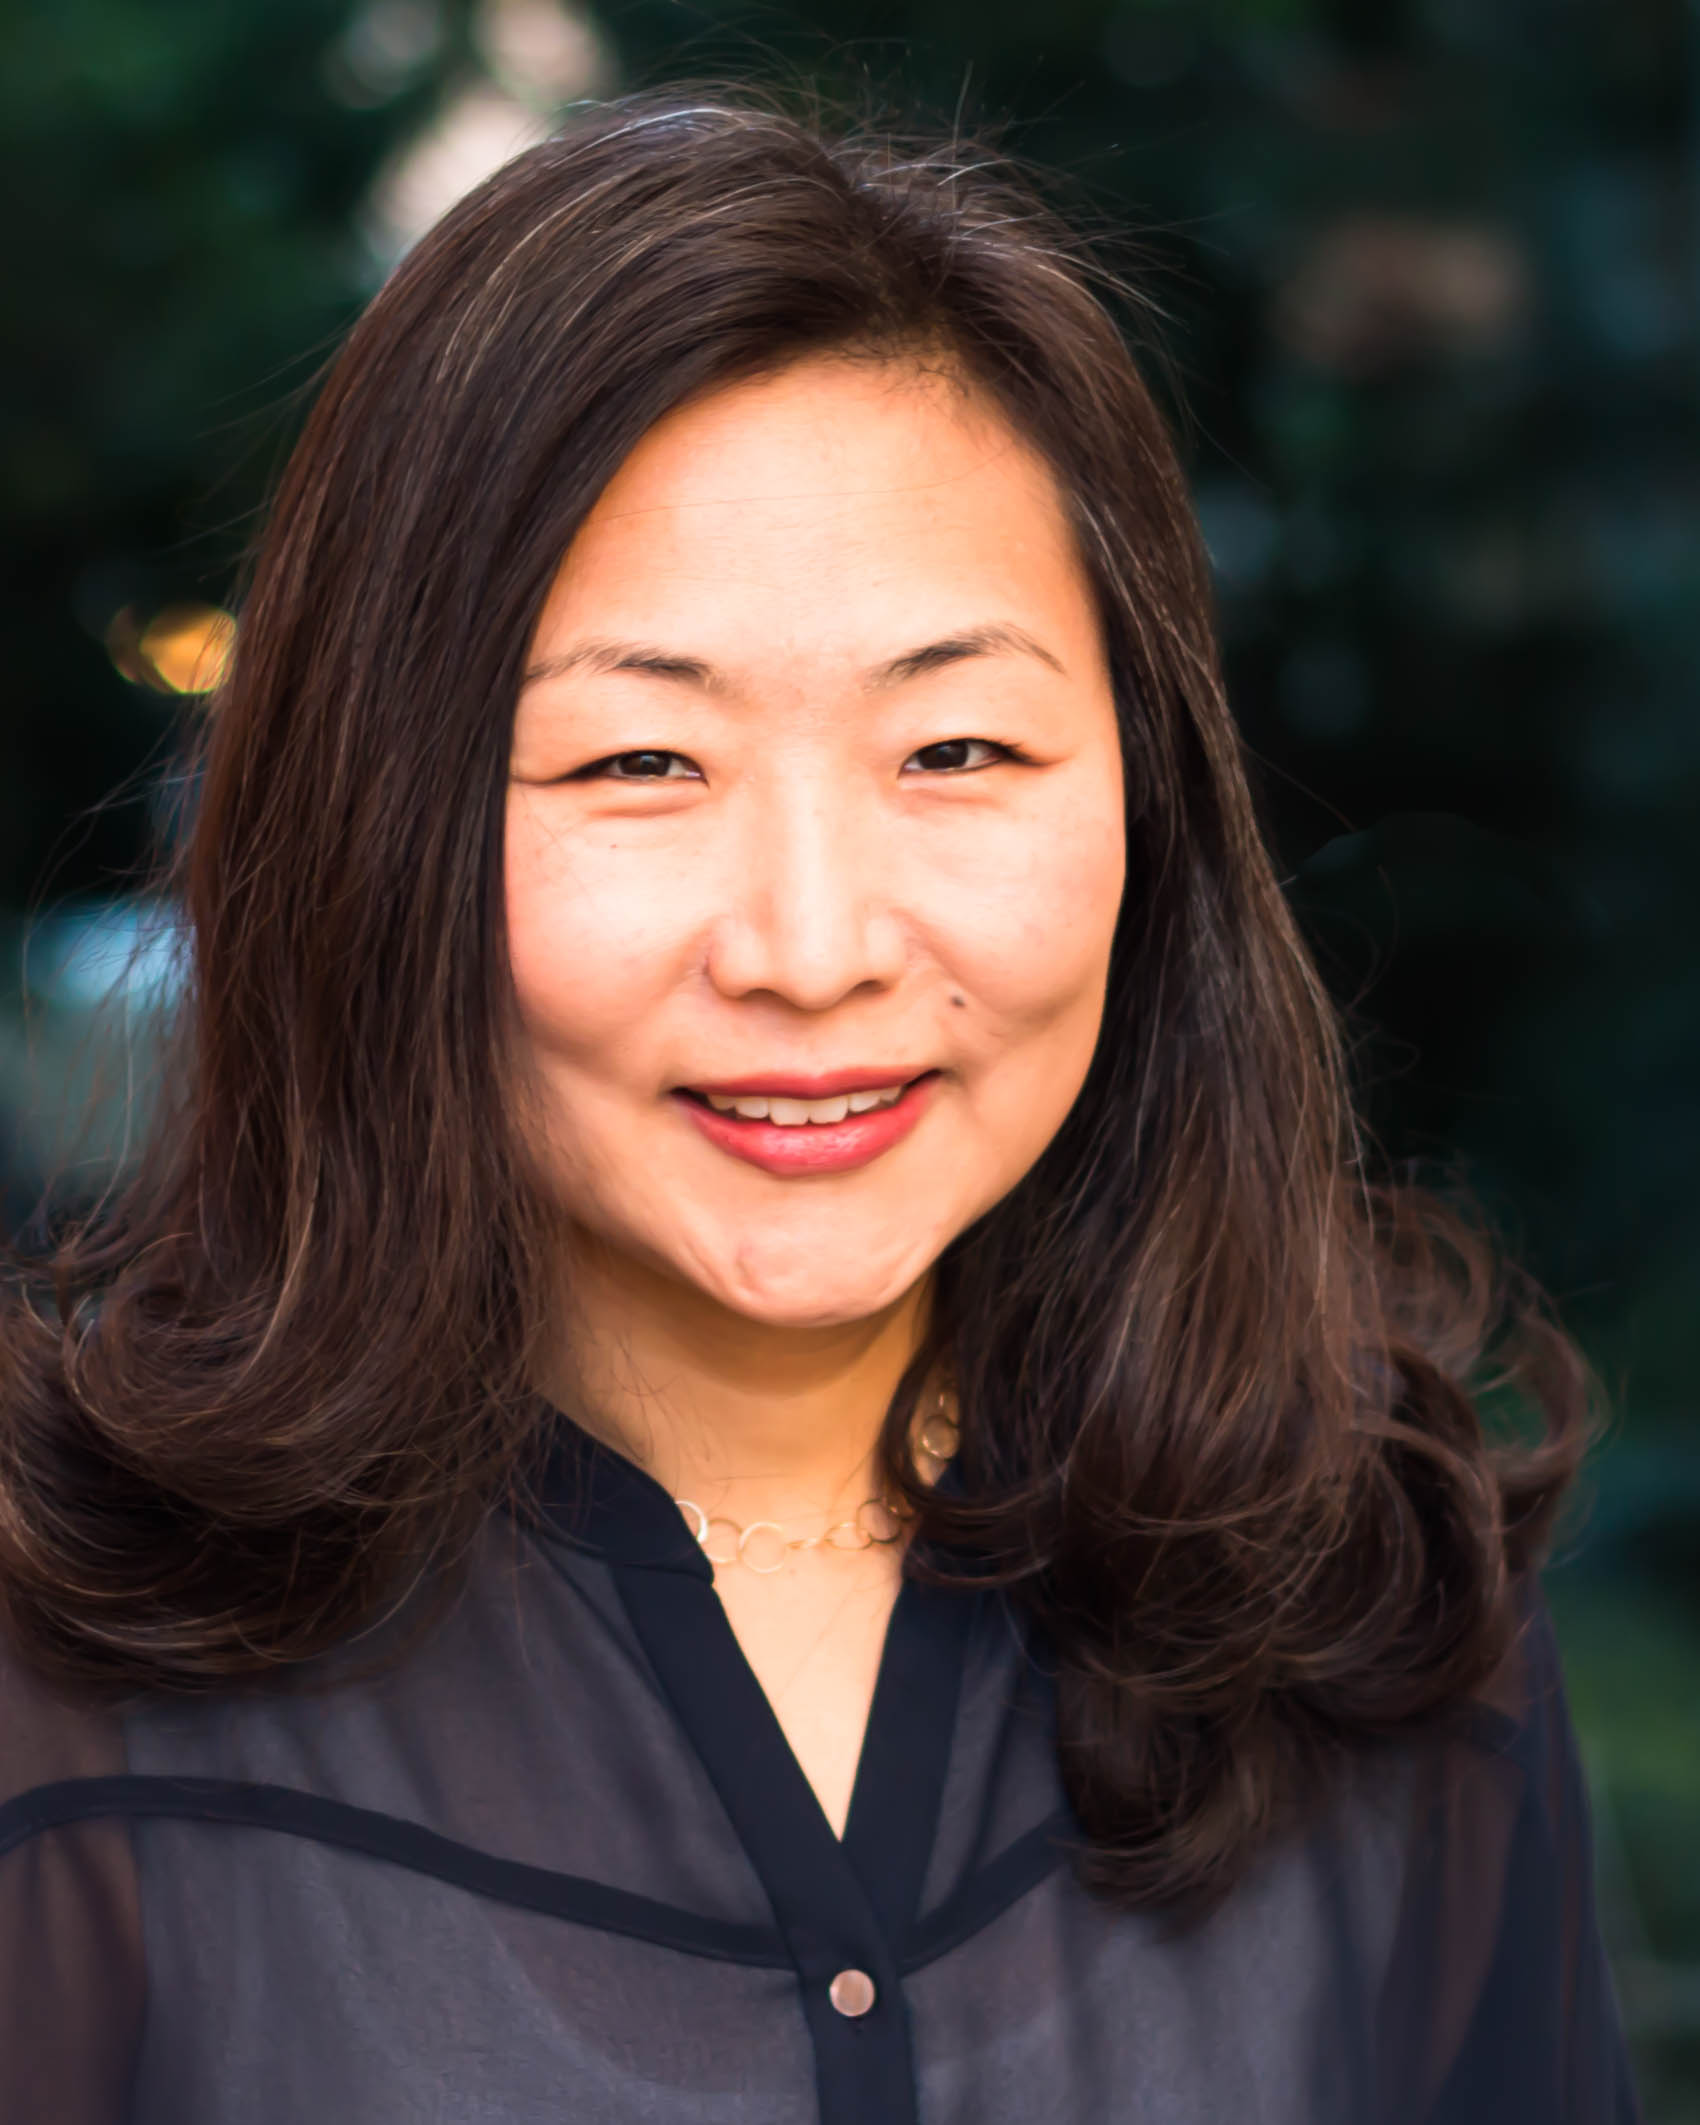 Sunna Jung